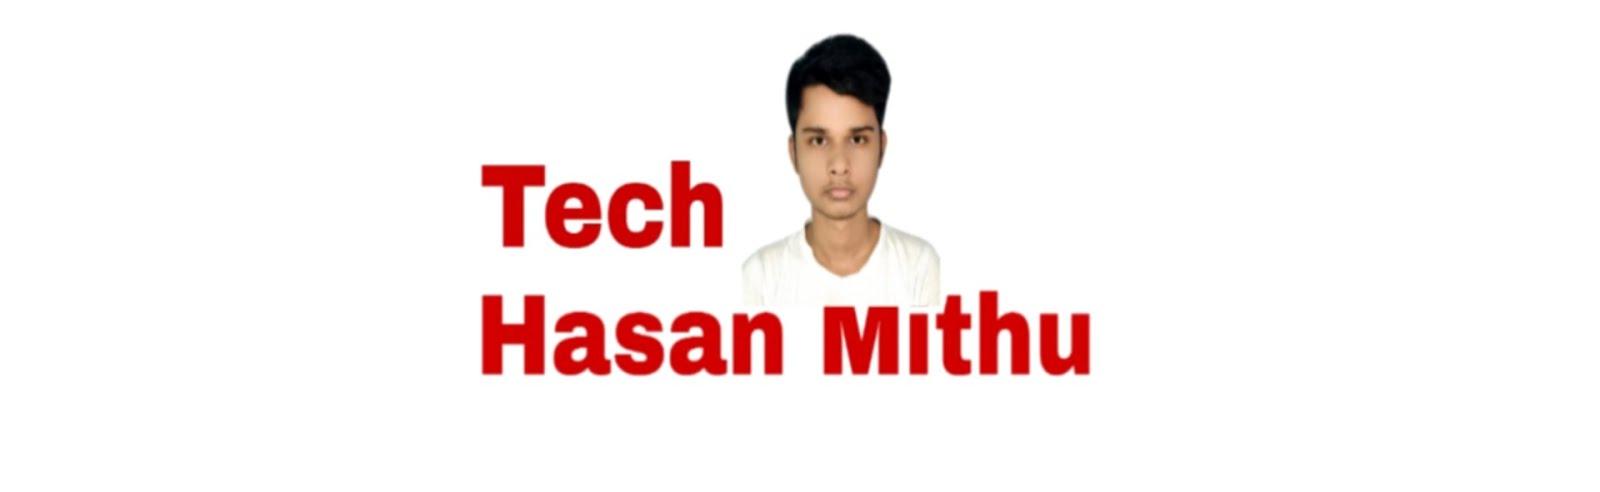 WhatsApp Group links 2019 - Technical Hasan Mithu